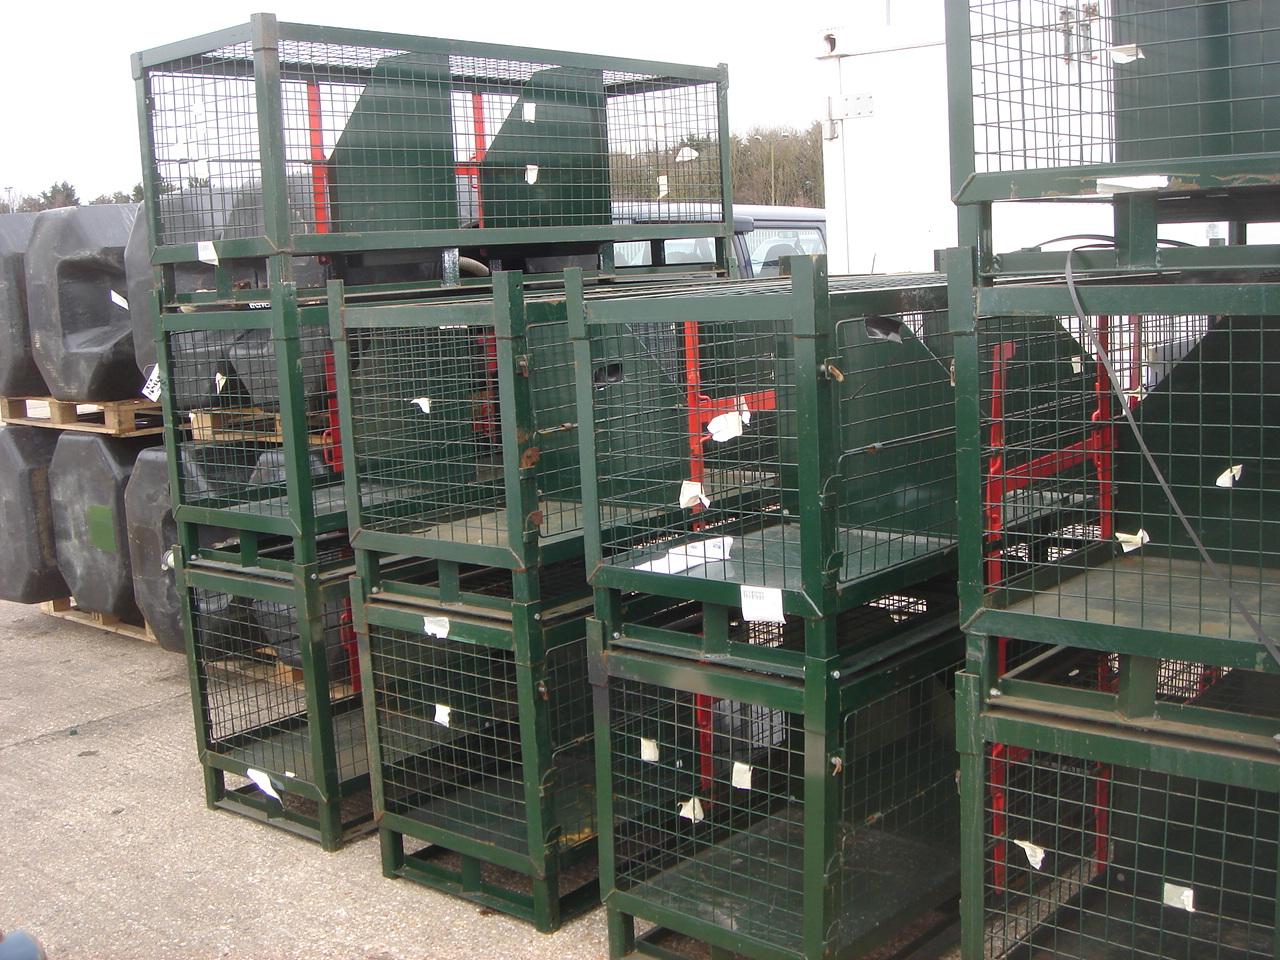 Military Storage Units - Military Storage Units 15 available